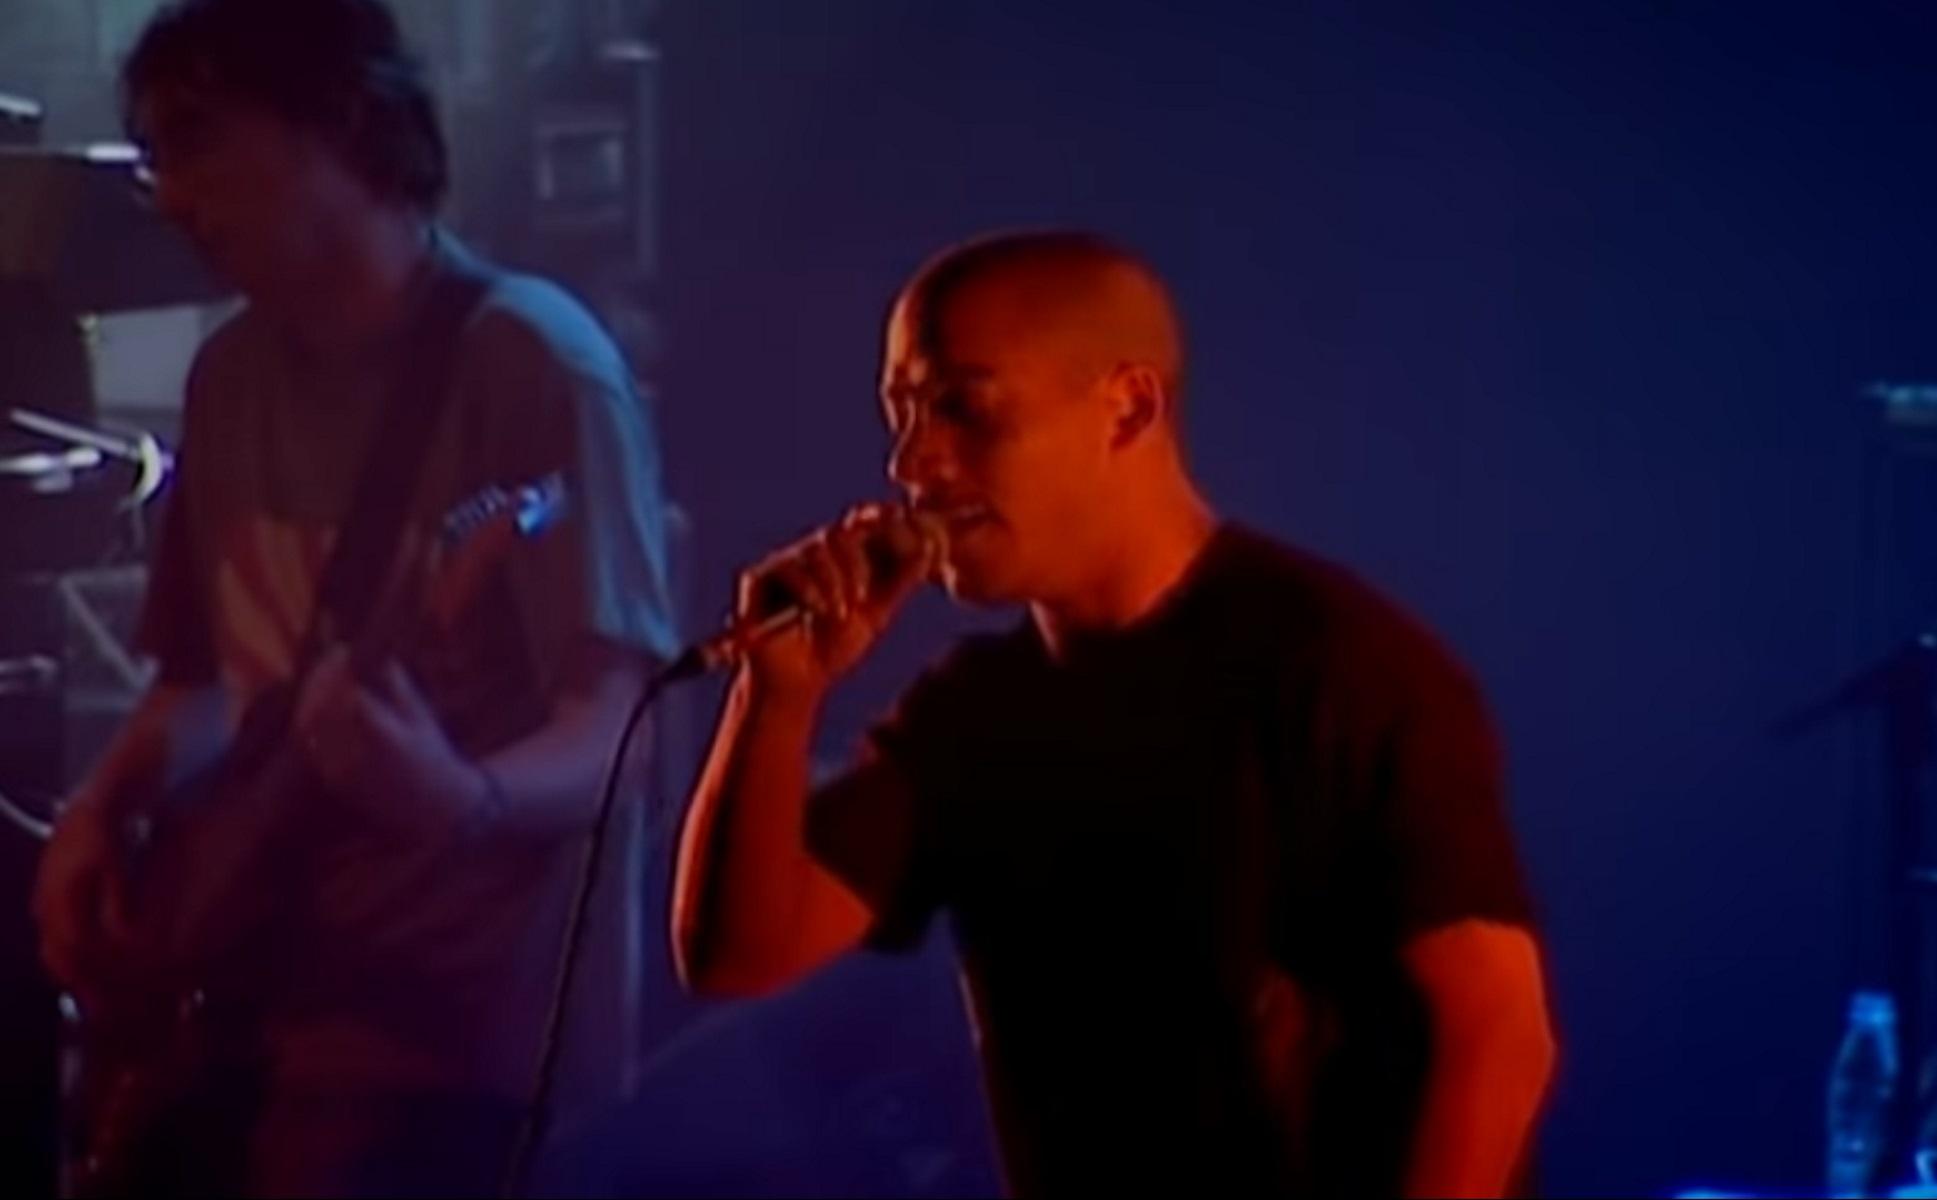 «Edge Of The Horizon»: Επιστρέφουν μετά από 10 χρόνια οι  Groove Armada με νέο άλμπουμ